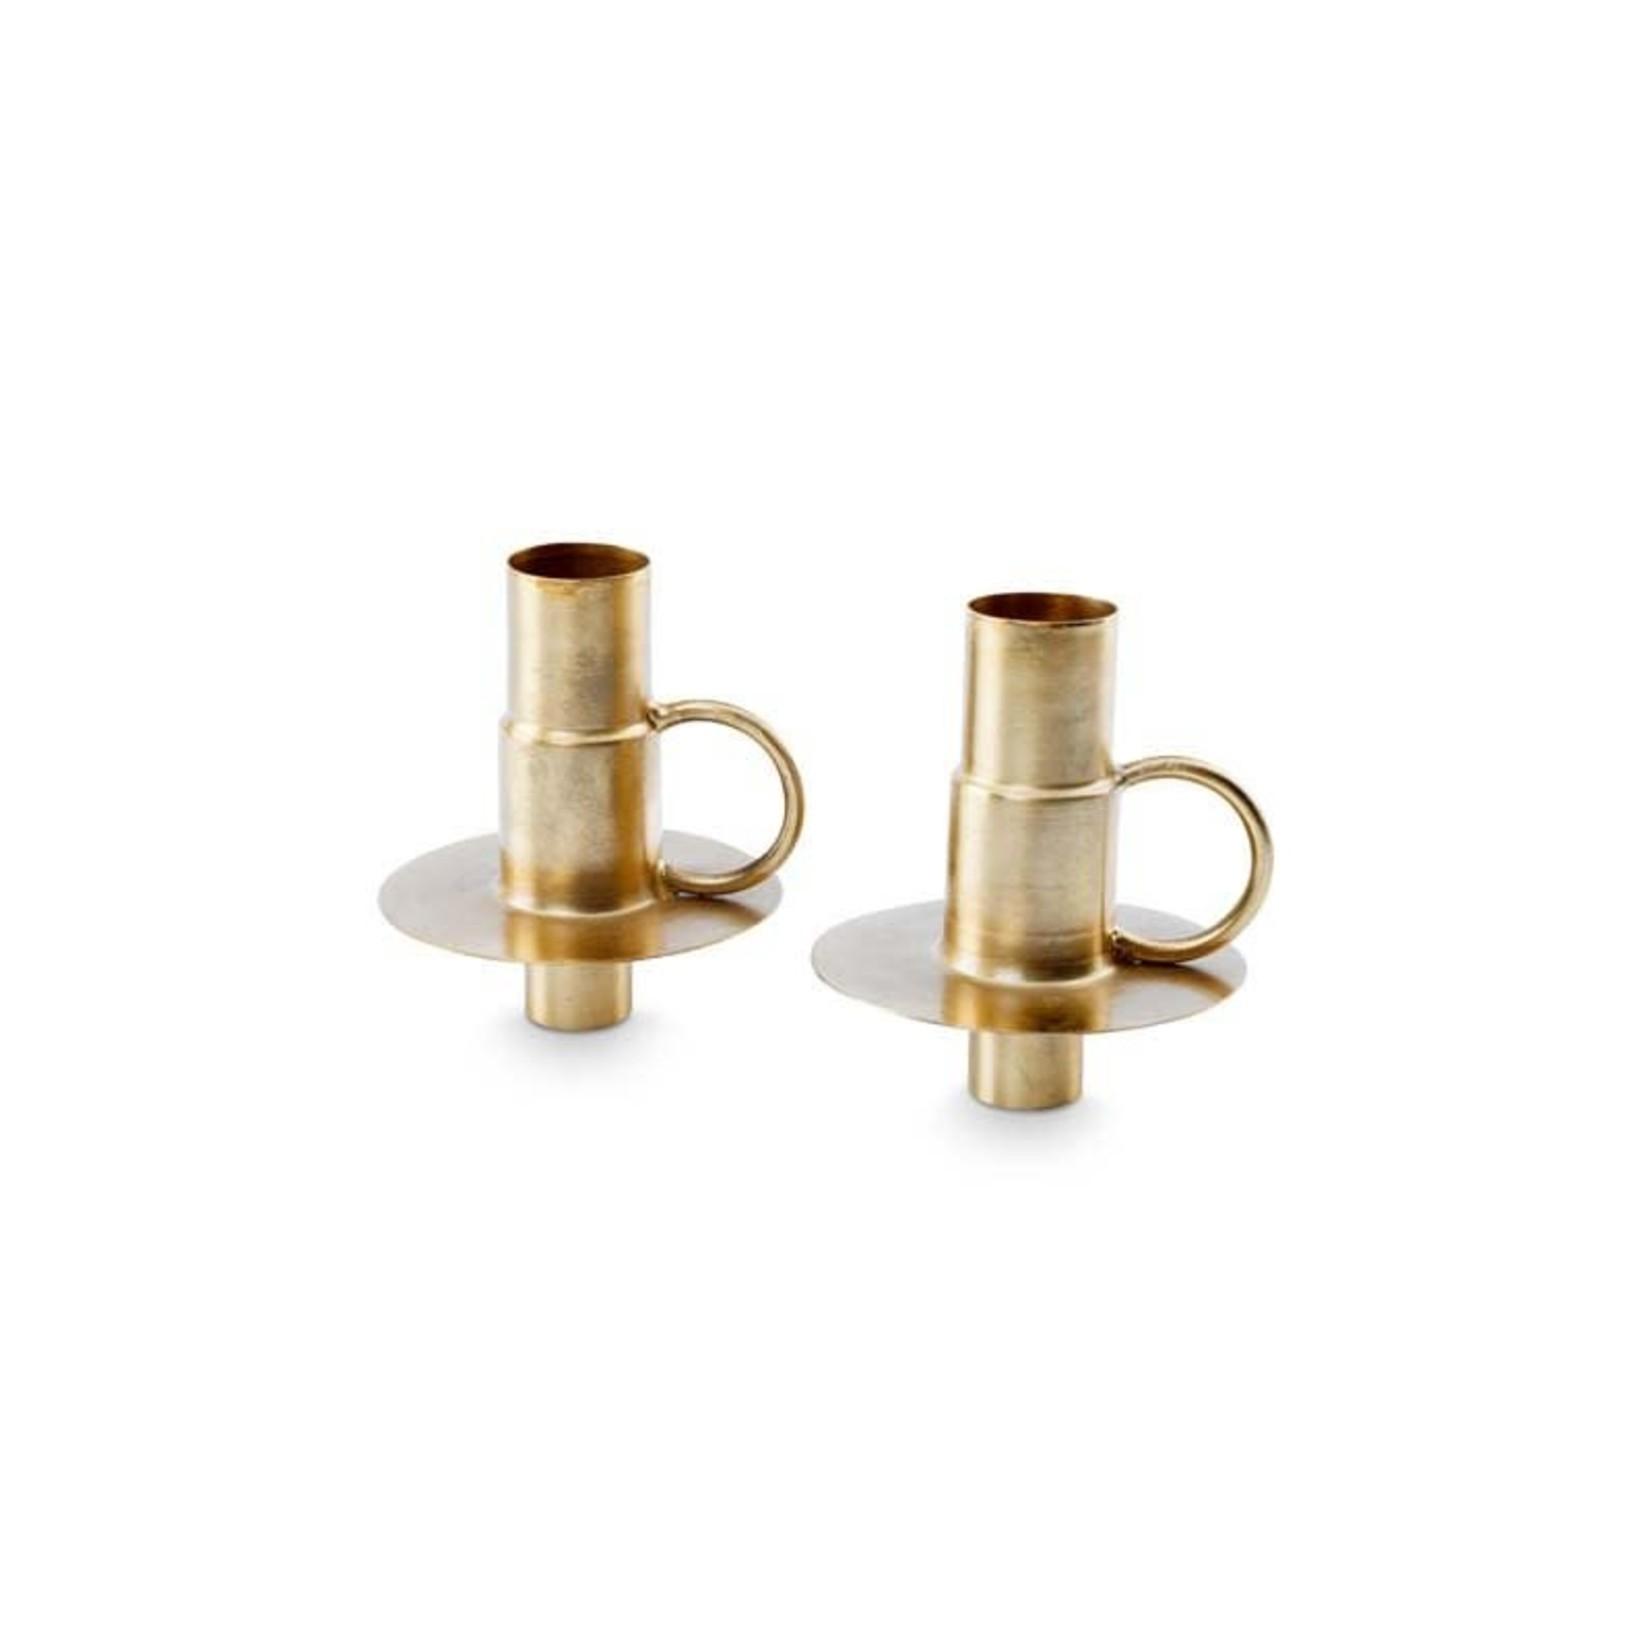 vtwonen Basic collection Bottle Candle Holder Metal Gold 7x8.5cm Per stuk